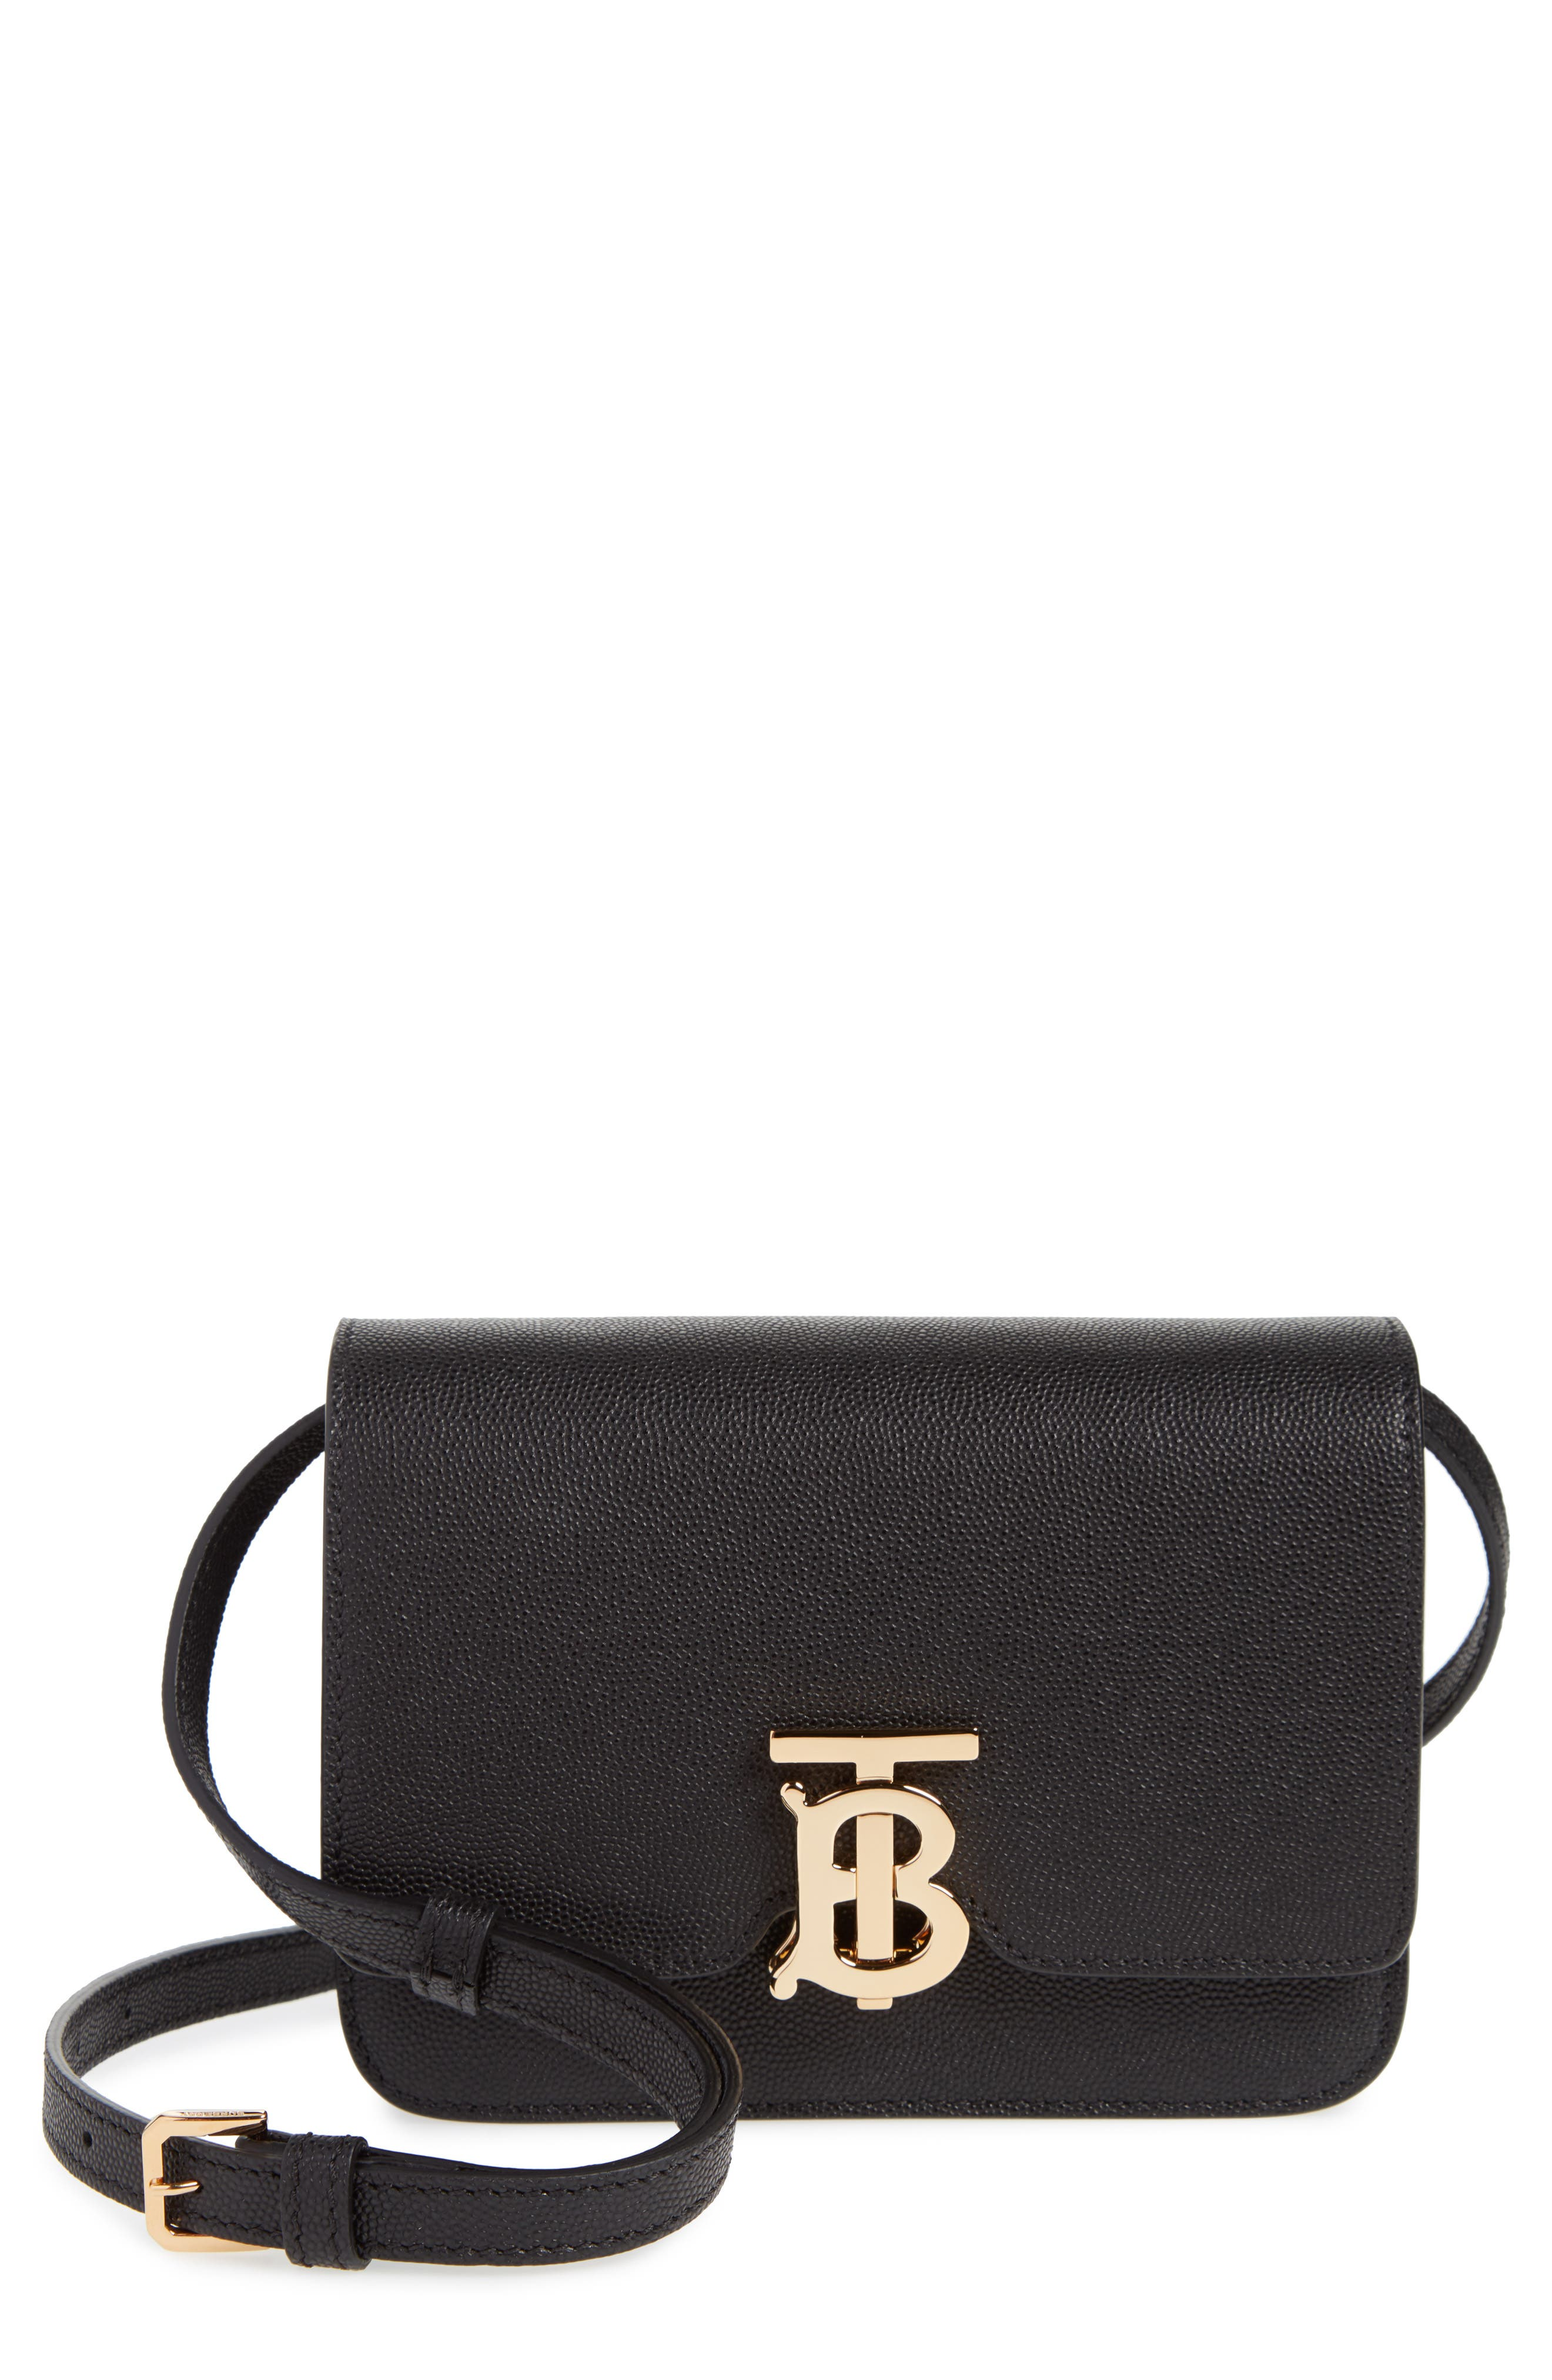 Burberry Mini TB Grainy Leather Bag | Nordstrom